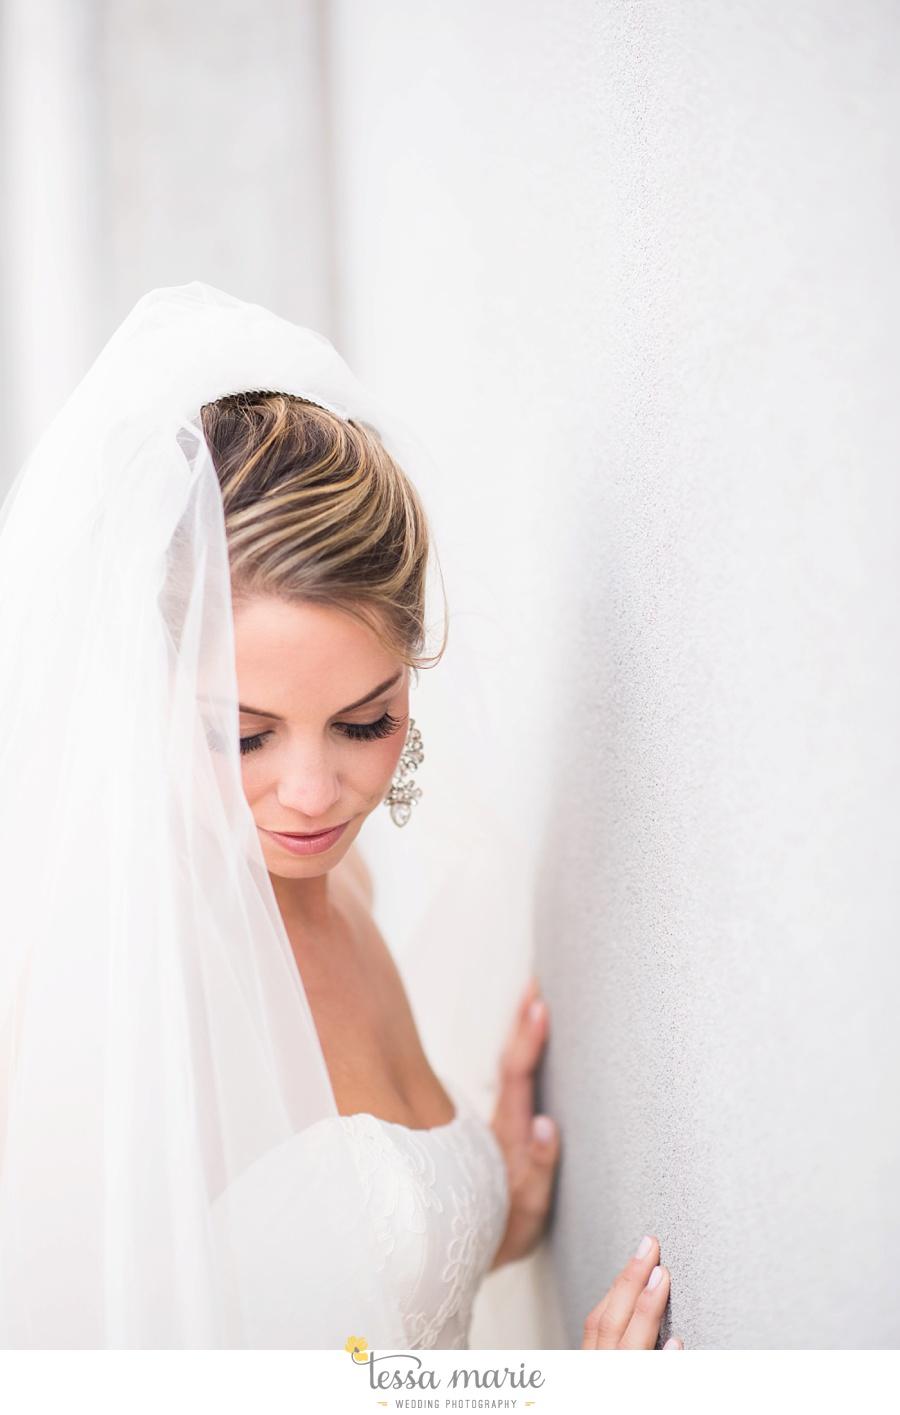 183_tessa_marie_weddings_emotional_moments_photography_king_low_wedding_sam_neil_best_atlanta_wedding_photographer